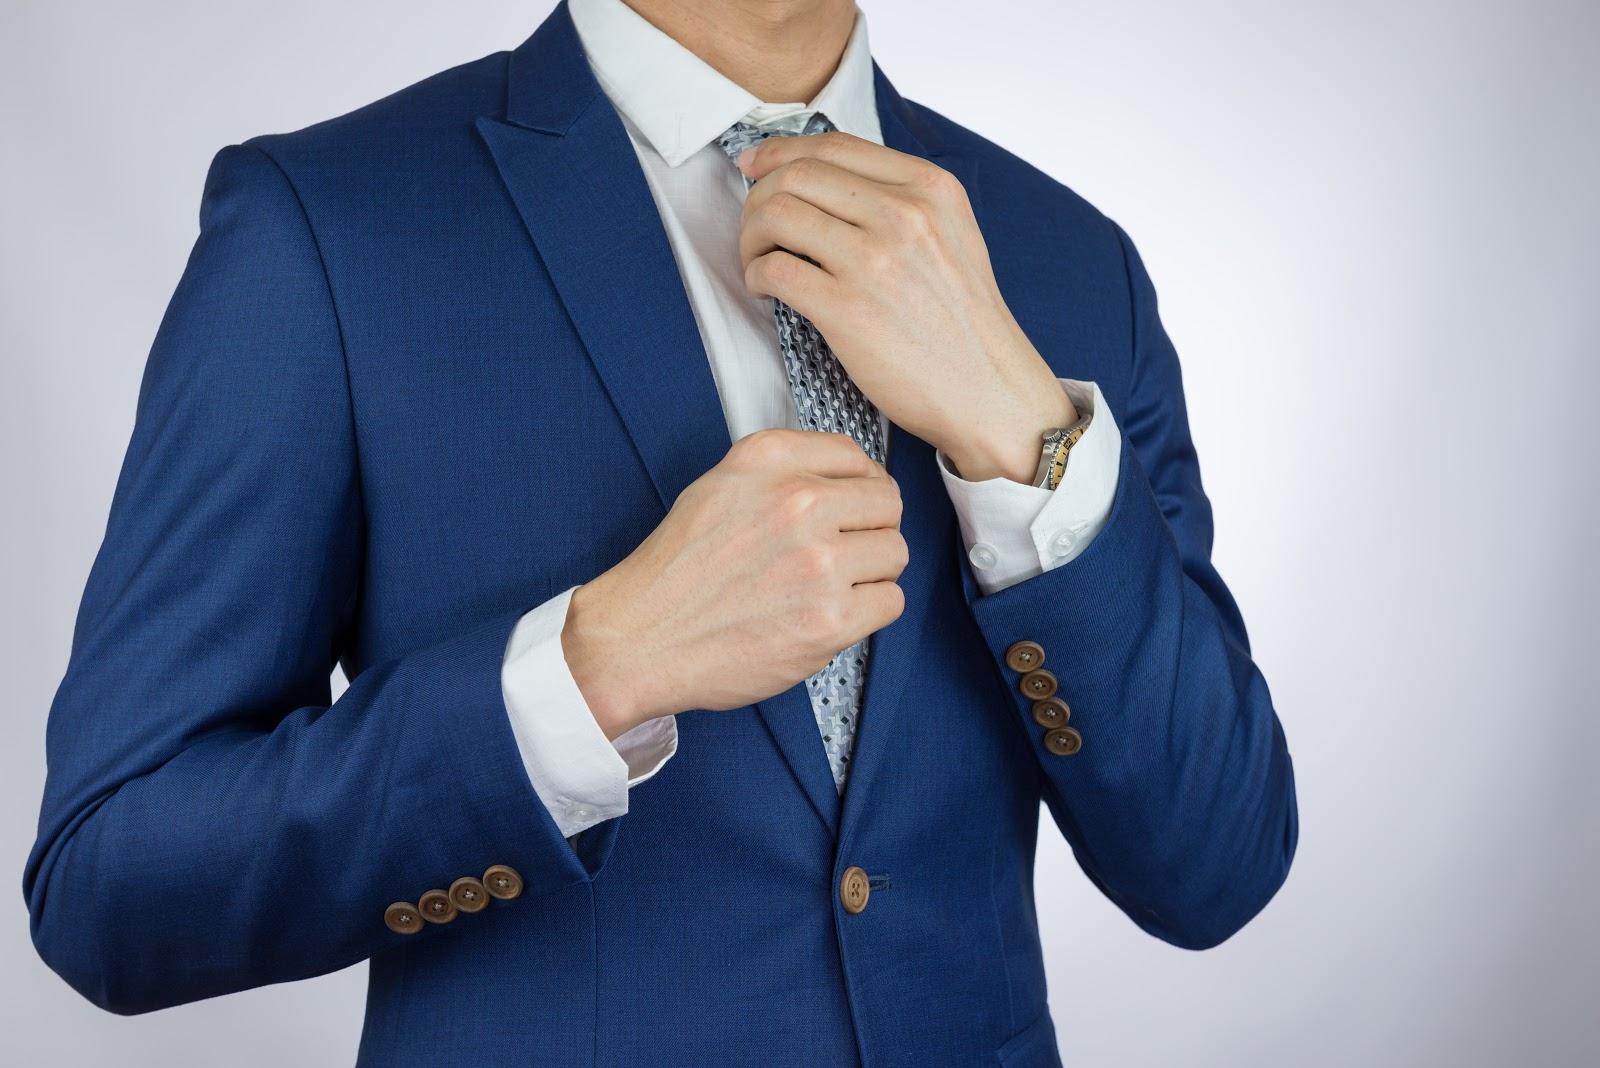 Singapore Tailor Guide_men adjusting tie